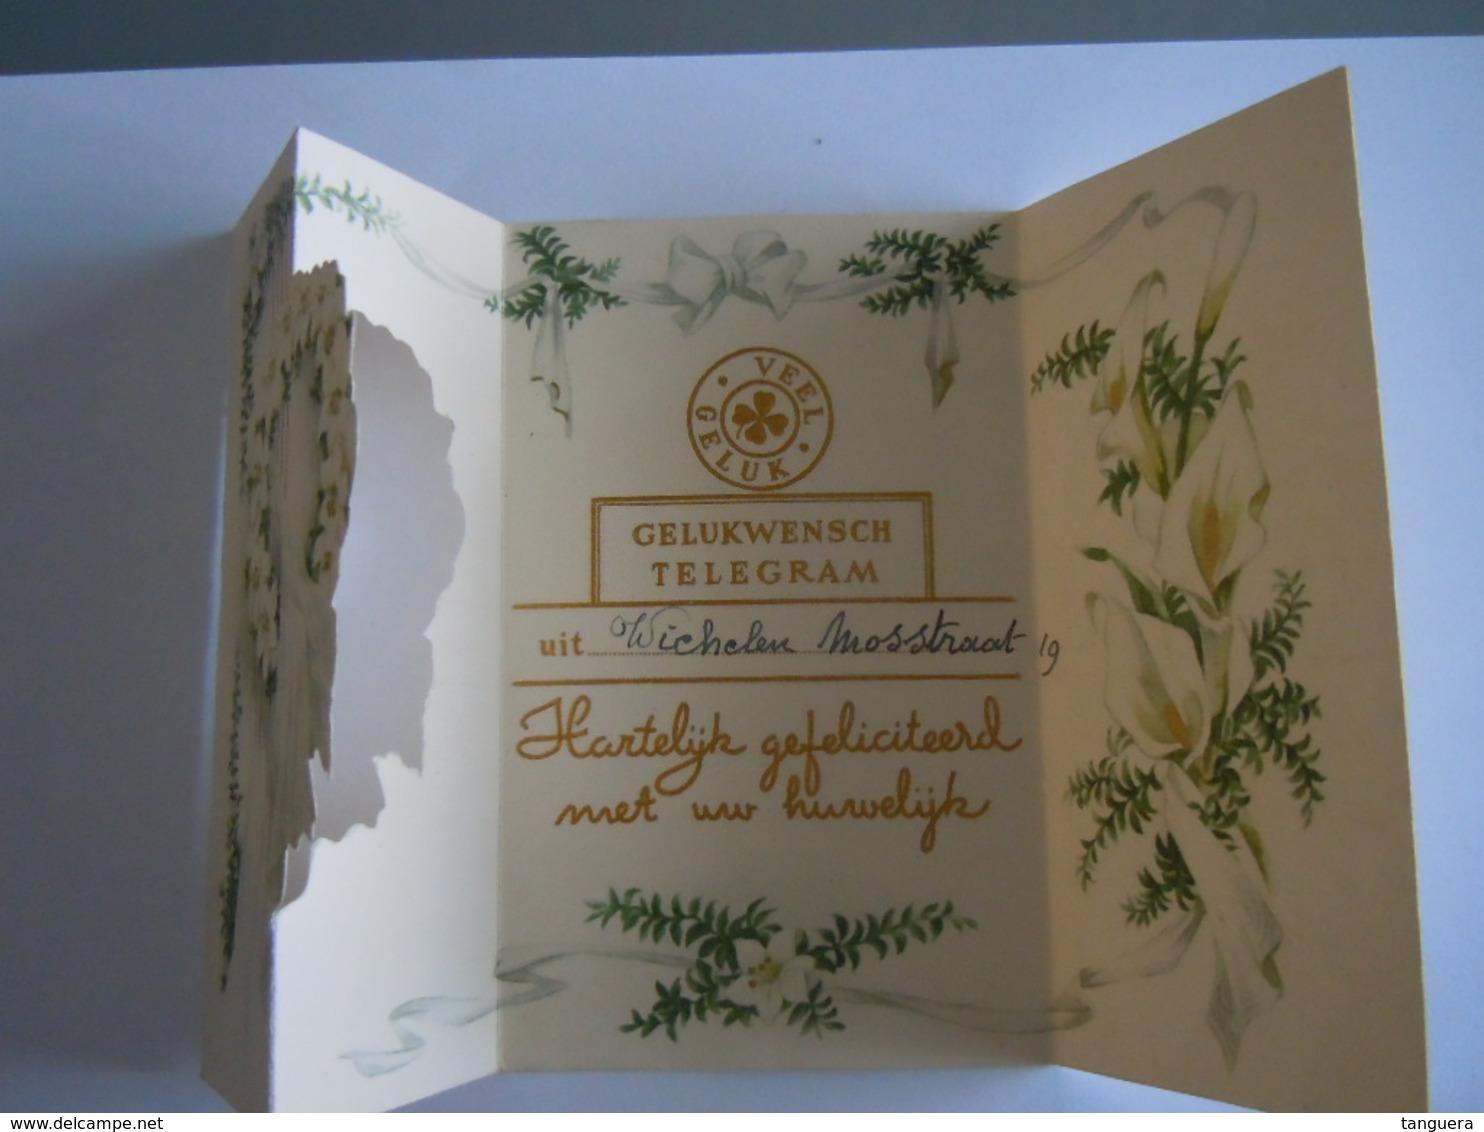 Huwelijk Mariage Gelukwensch Telegram Télégramme De Bonheur Lelie Lis Wichelen Belgium - Holidays & Celebrations